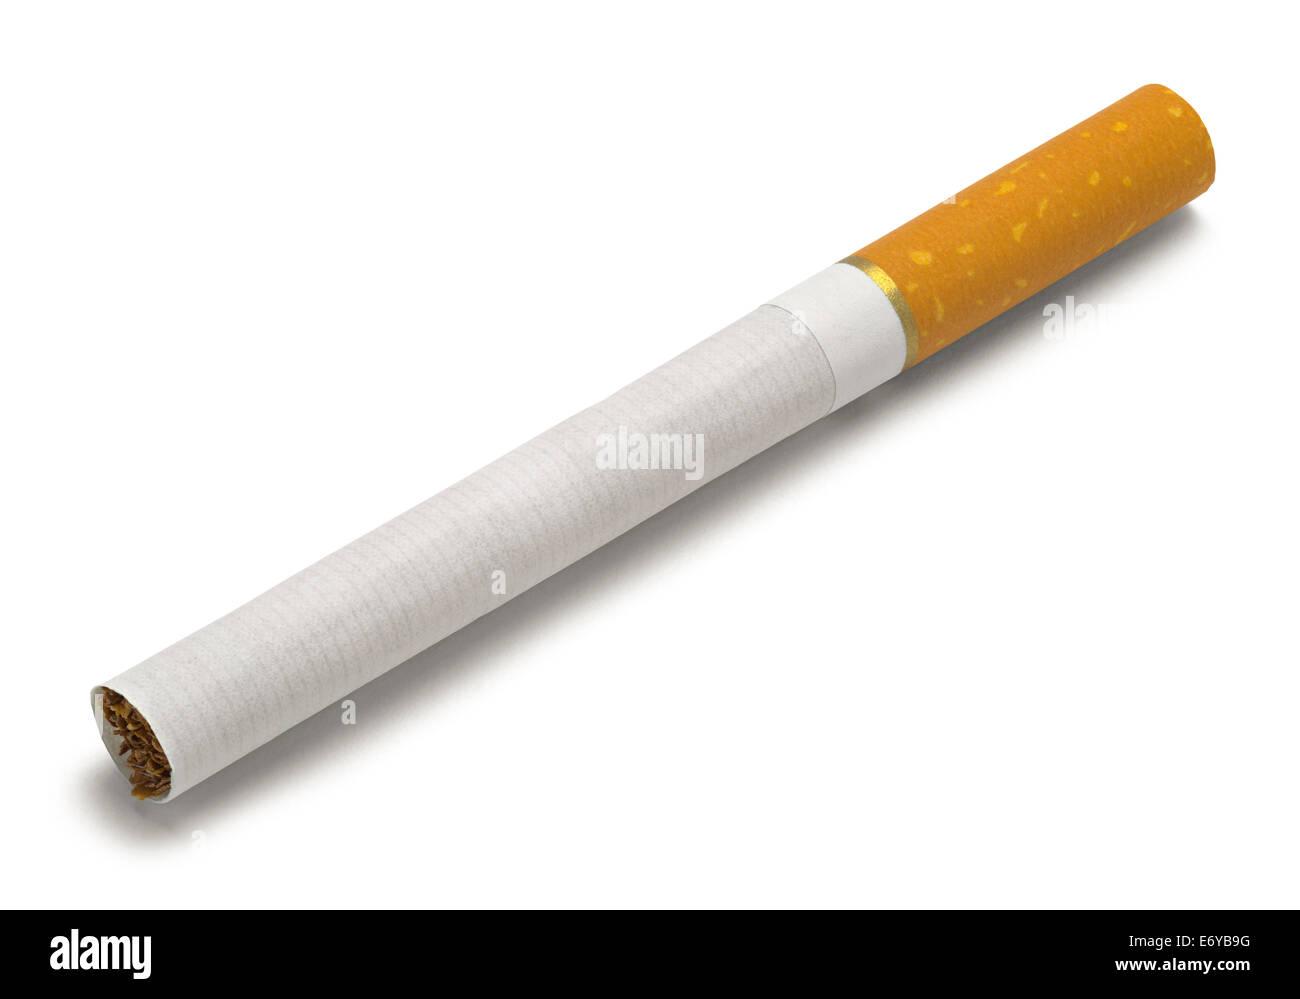 Single New Cigarette Isolated on White Background. - Stock Image